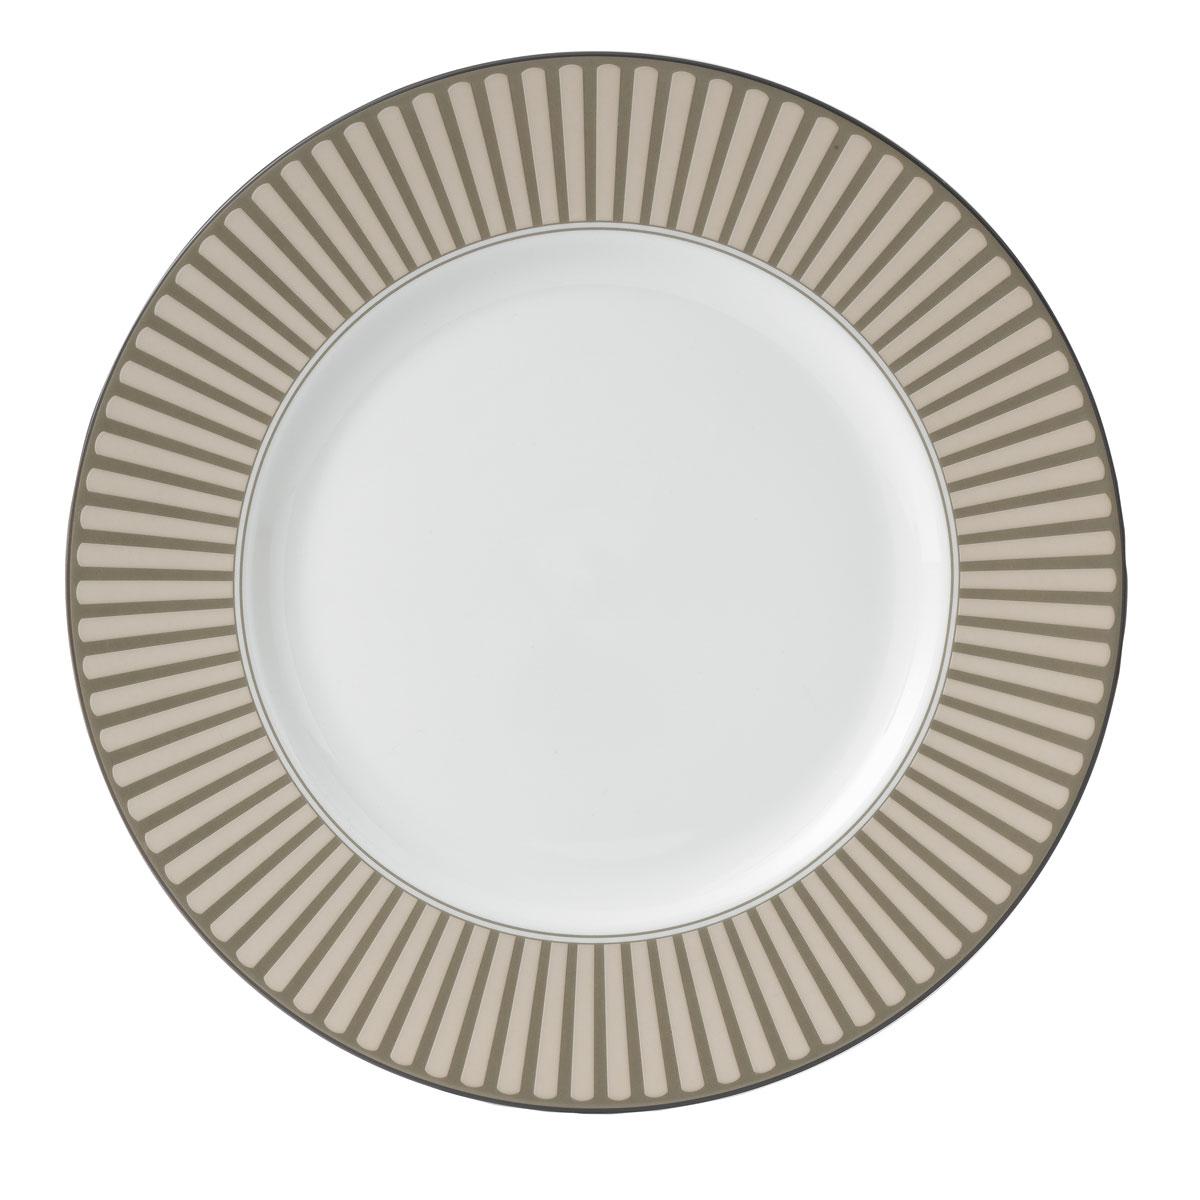 "Wedgwood China Parkland Dinner Plate 10.75"""